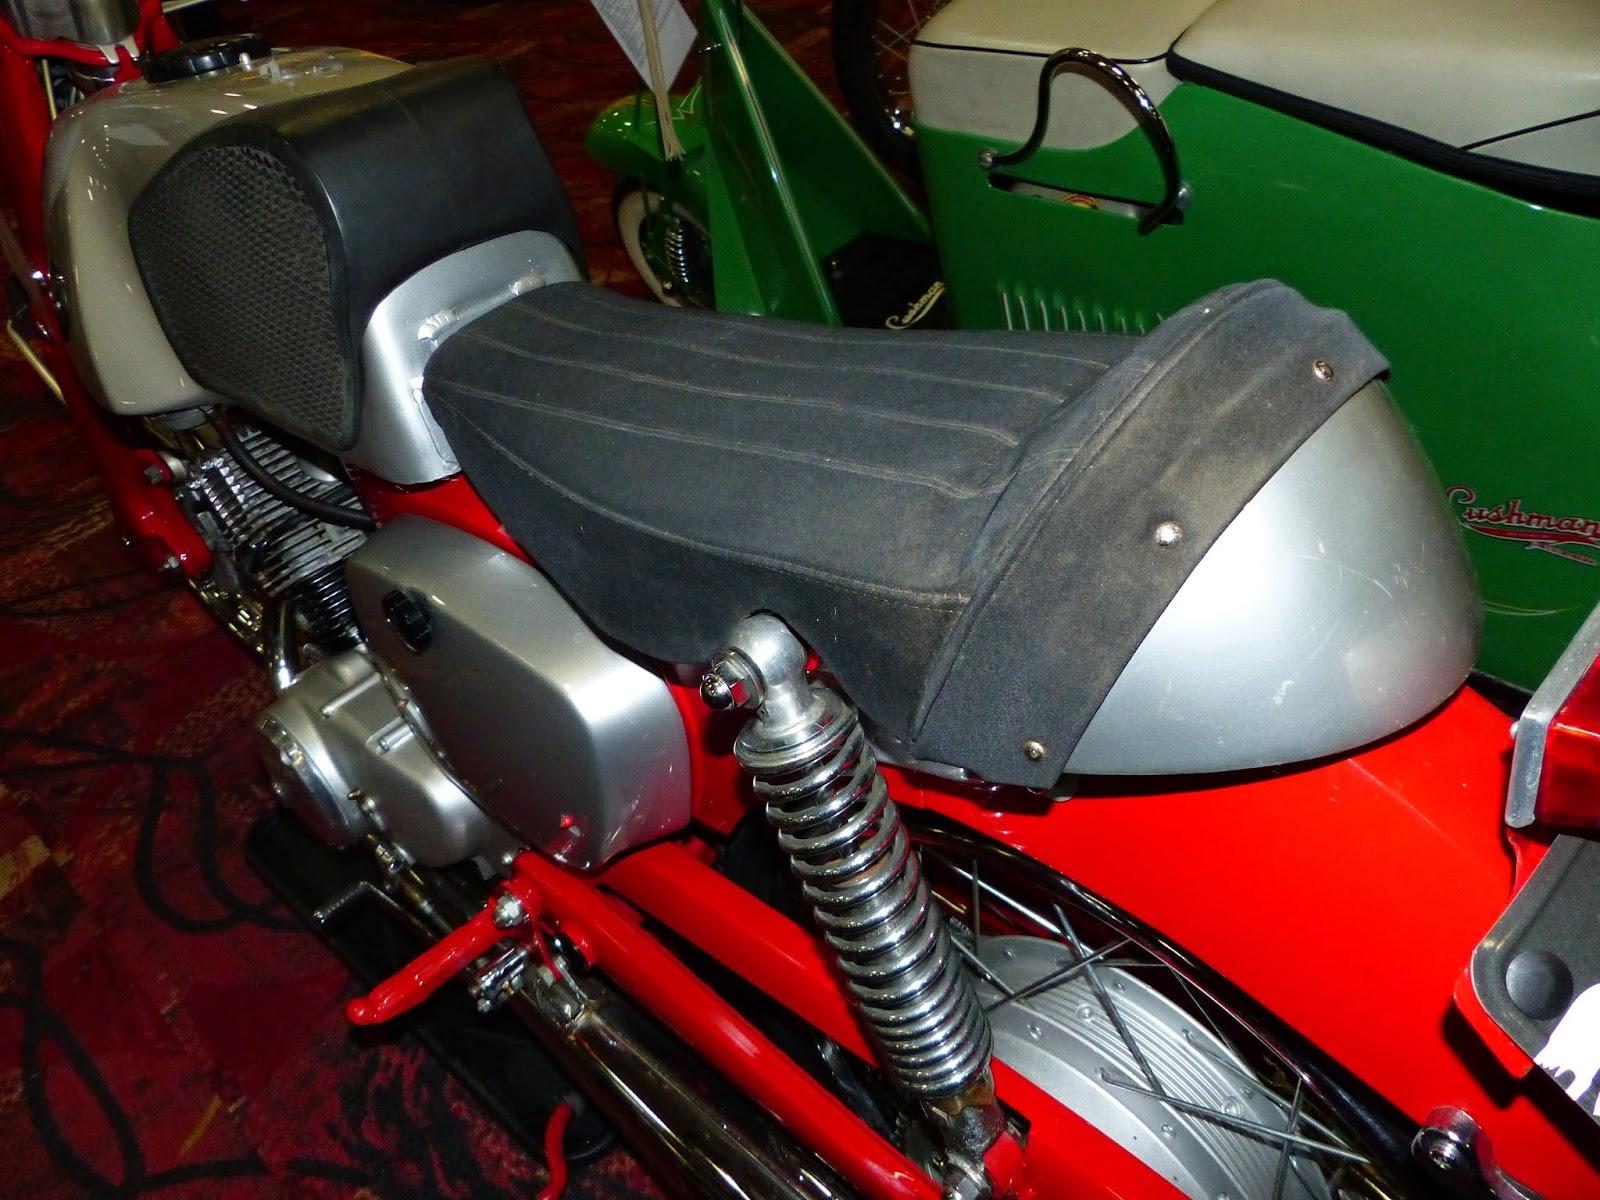 OldMotoDude  1960 Honda Benly 125 Super Sport for sale at the 2015